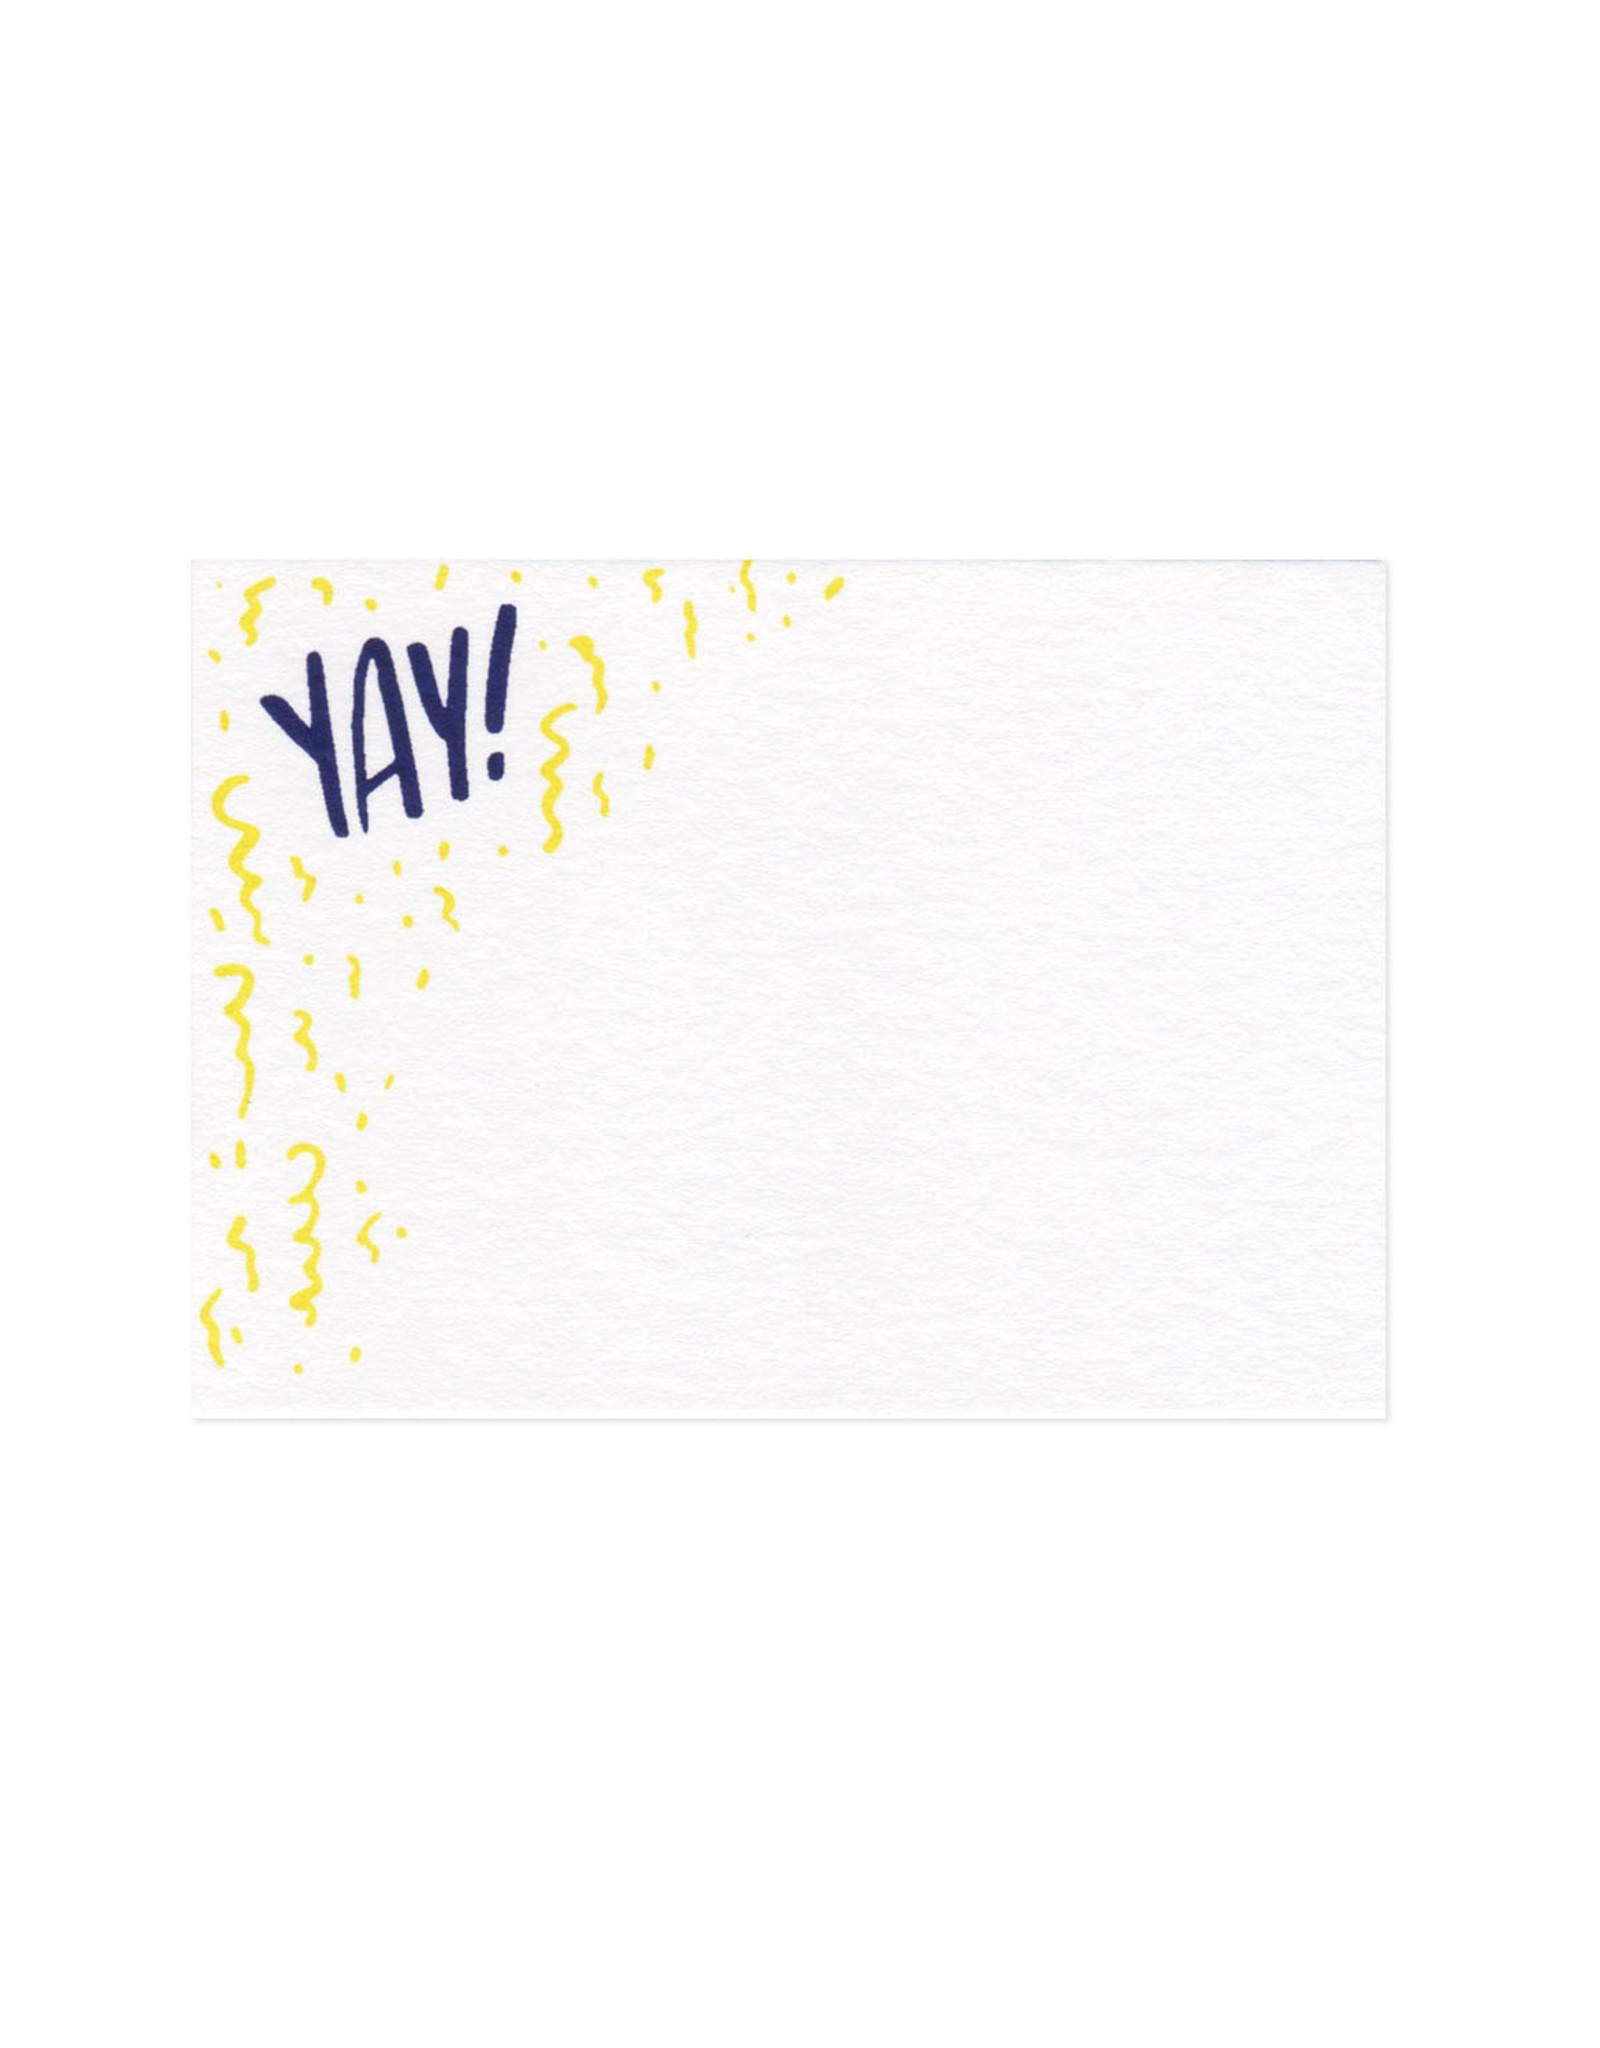 Yay! Mini Card Set of 10